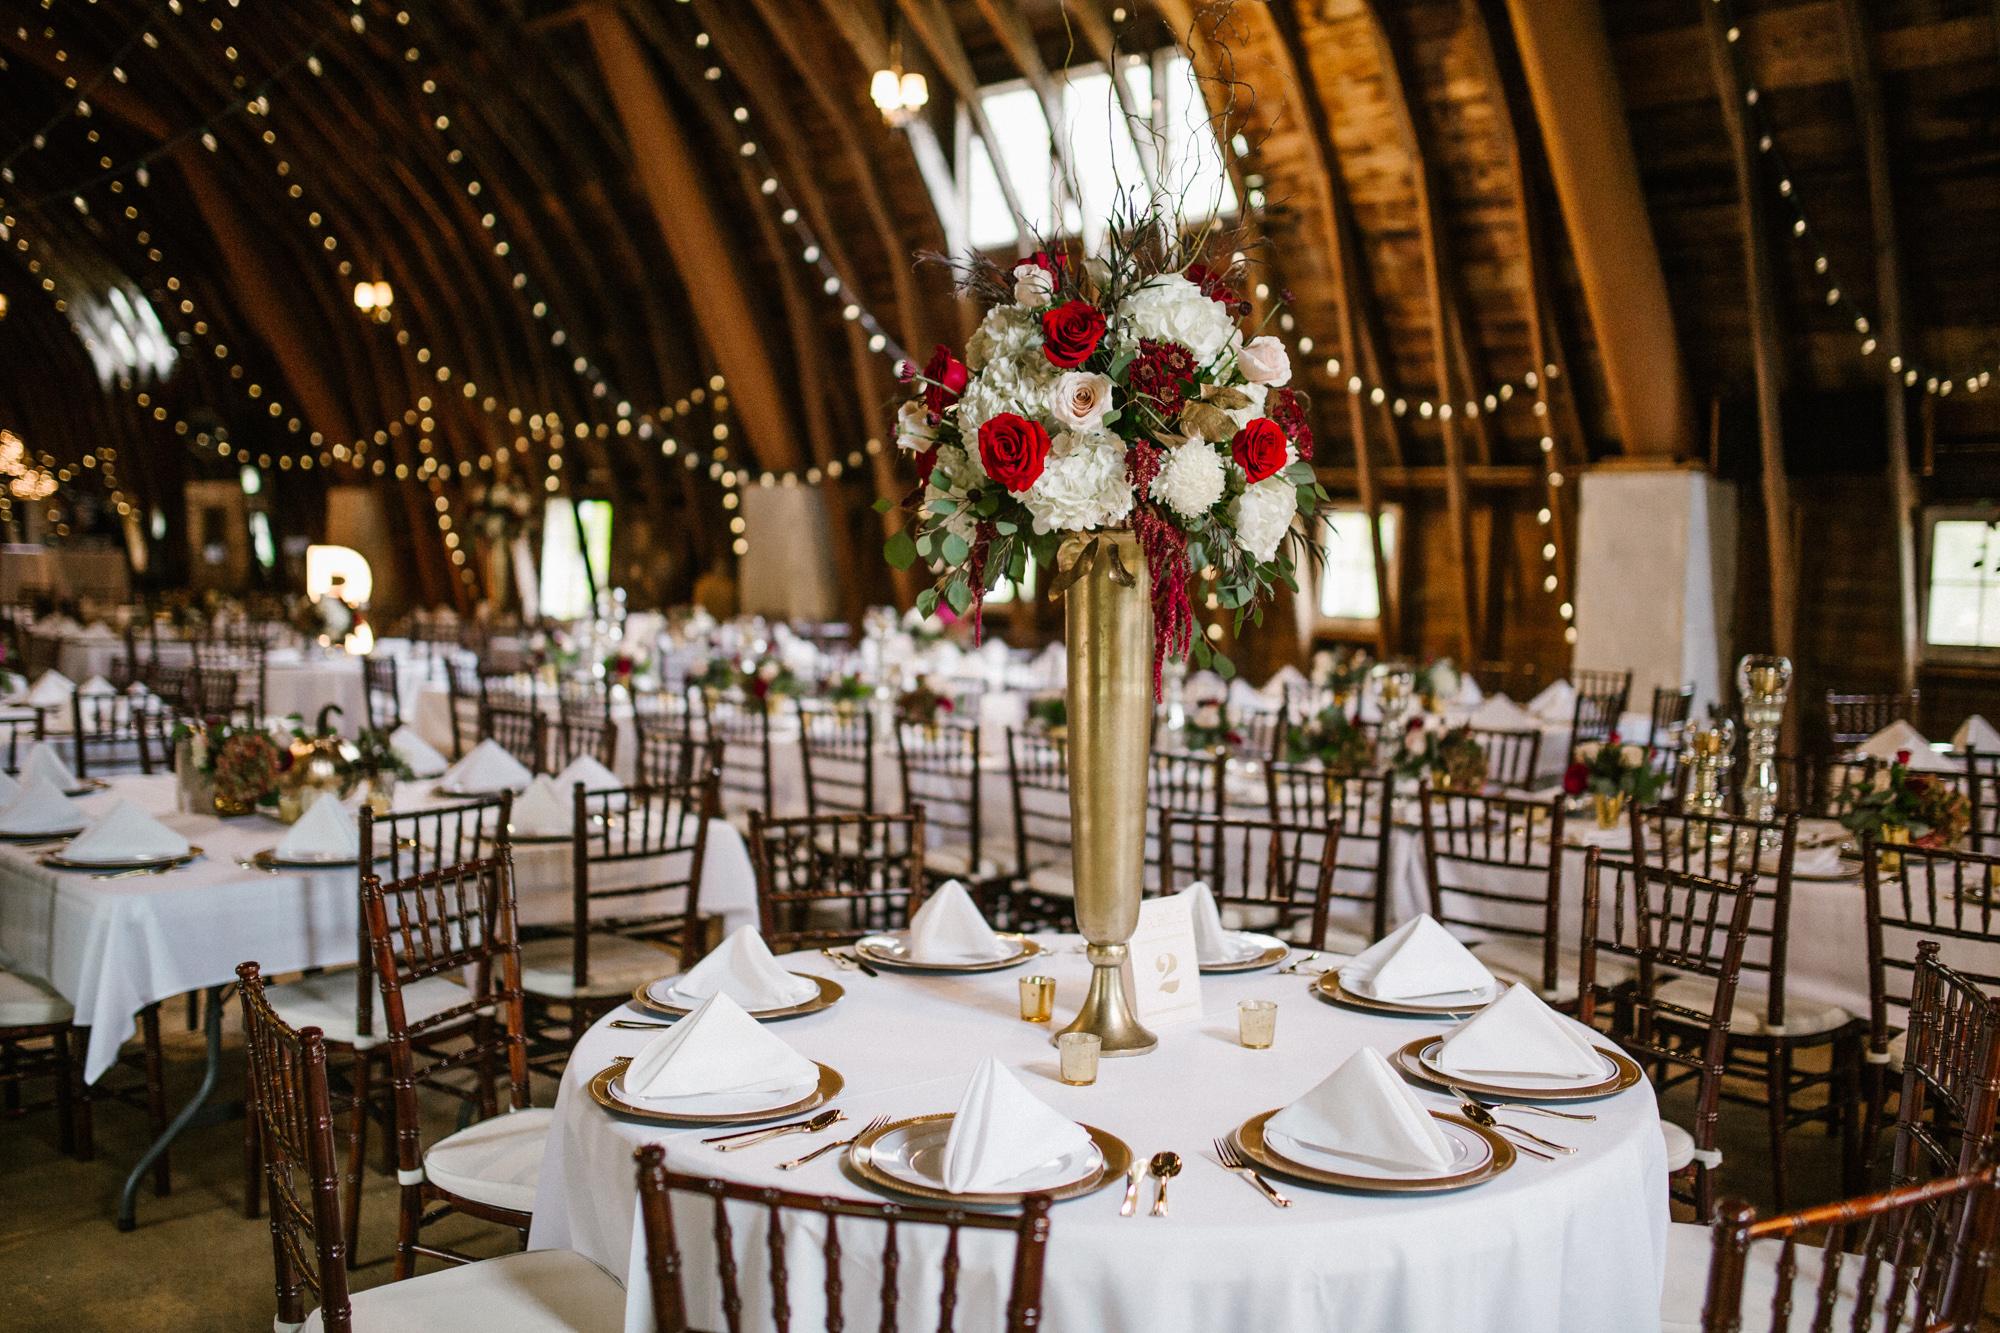 blue-dress-barn-benton-harbor-southwest-michigan-wedding-photogapher-sydney-marie  (3).jpg